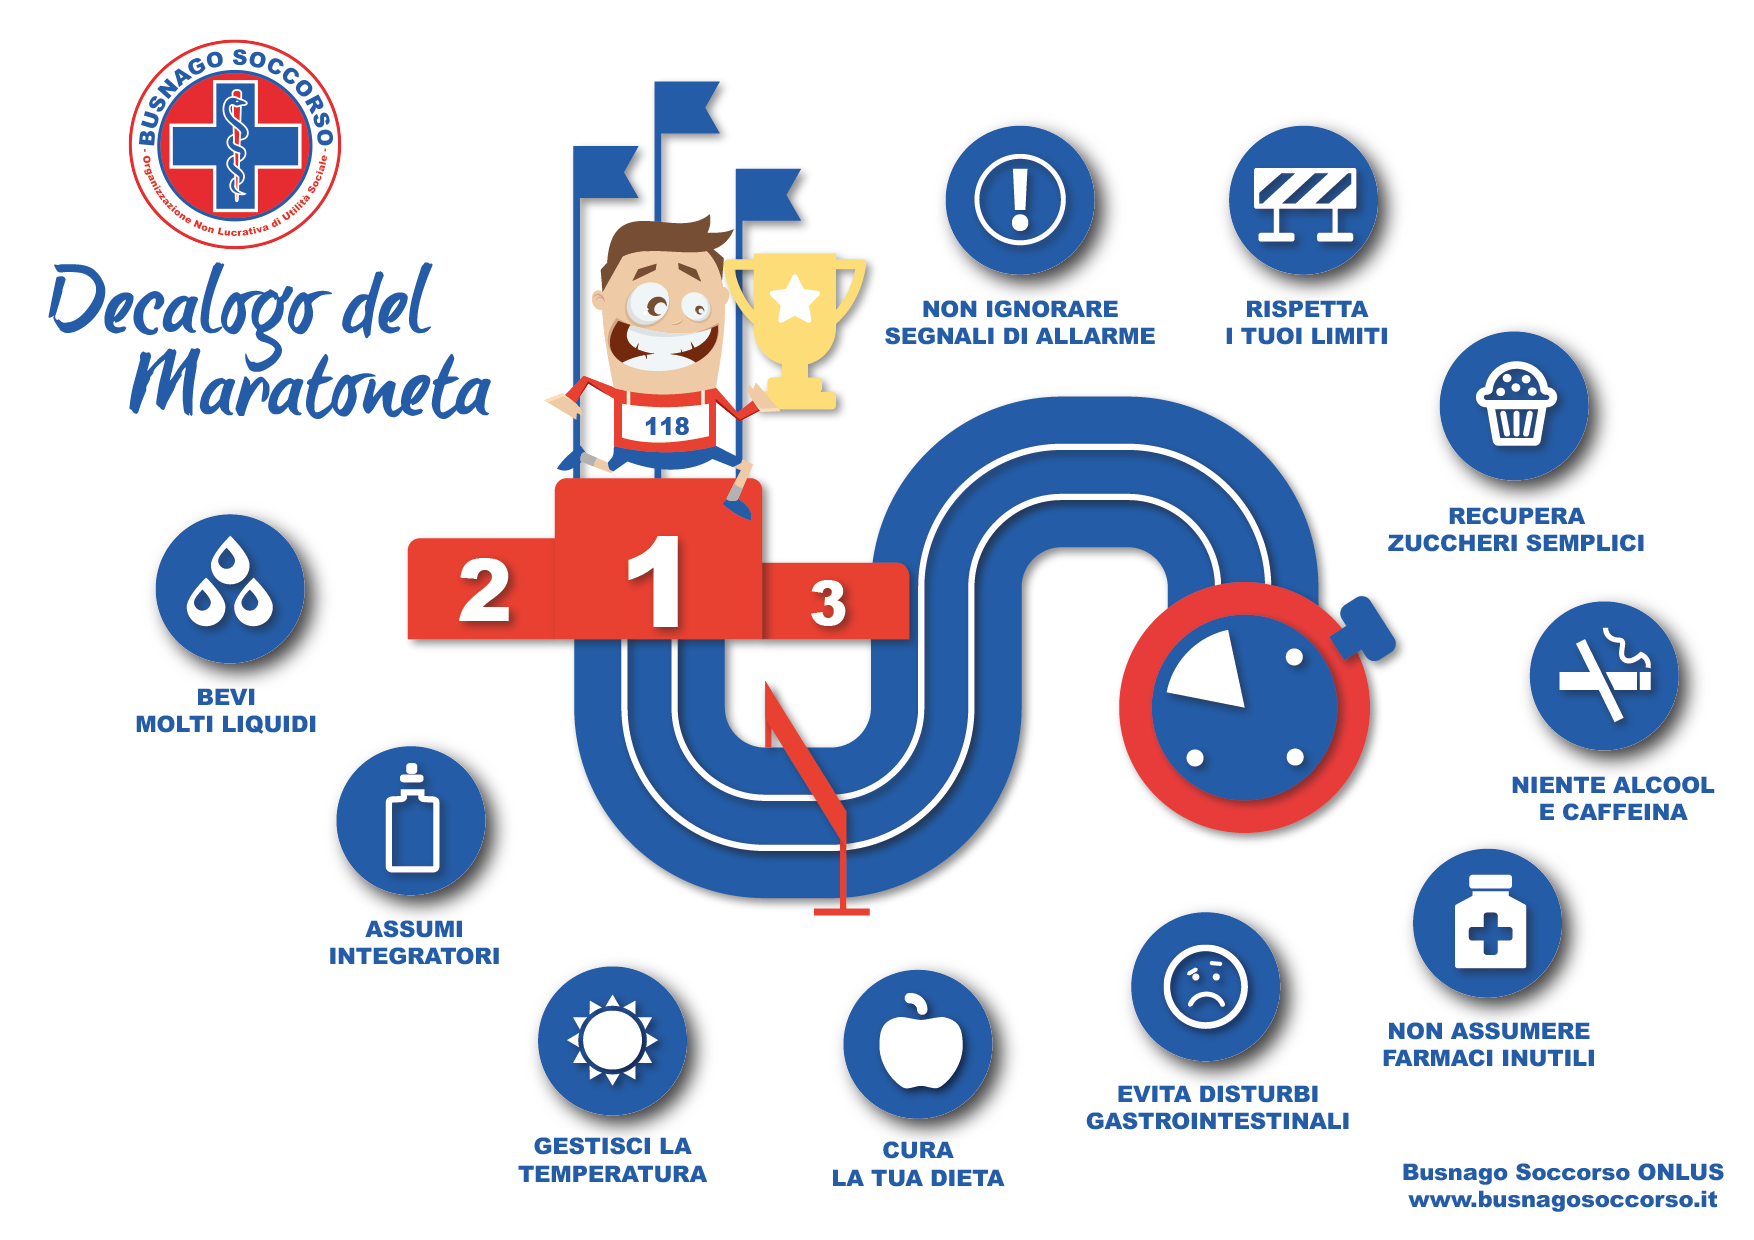 decalogo_medico_maratoneta